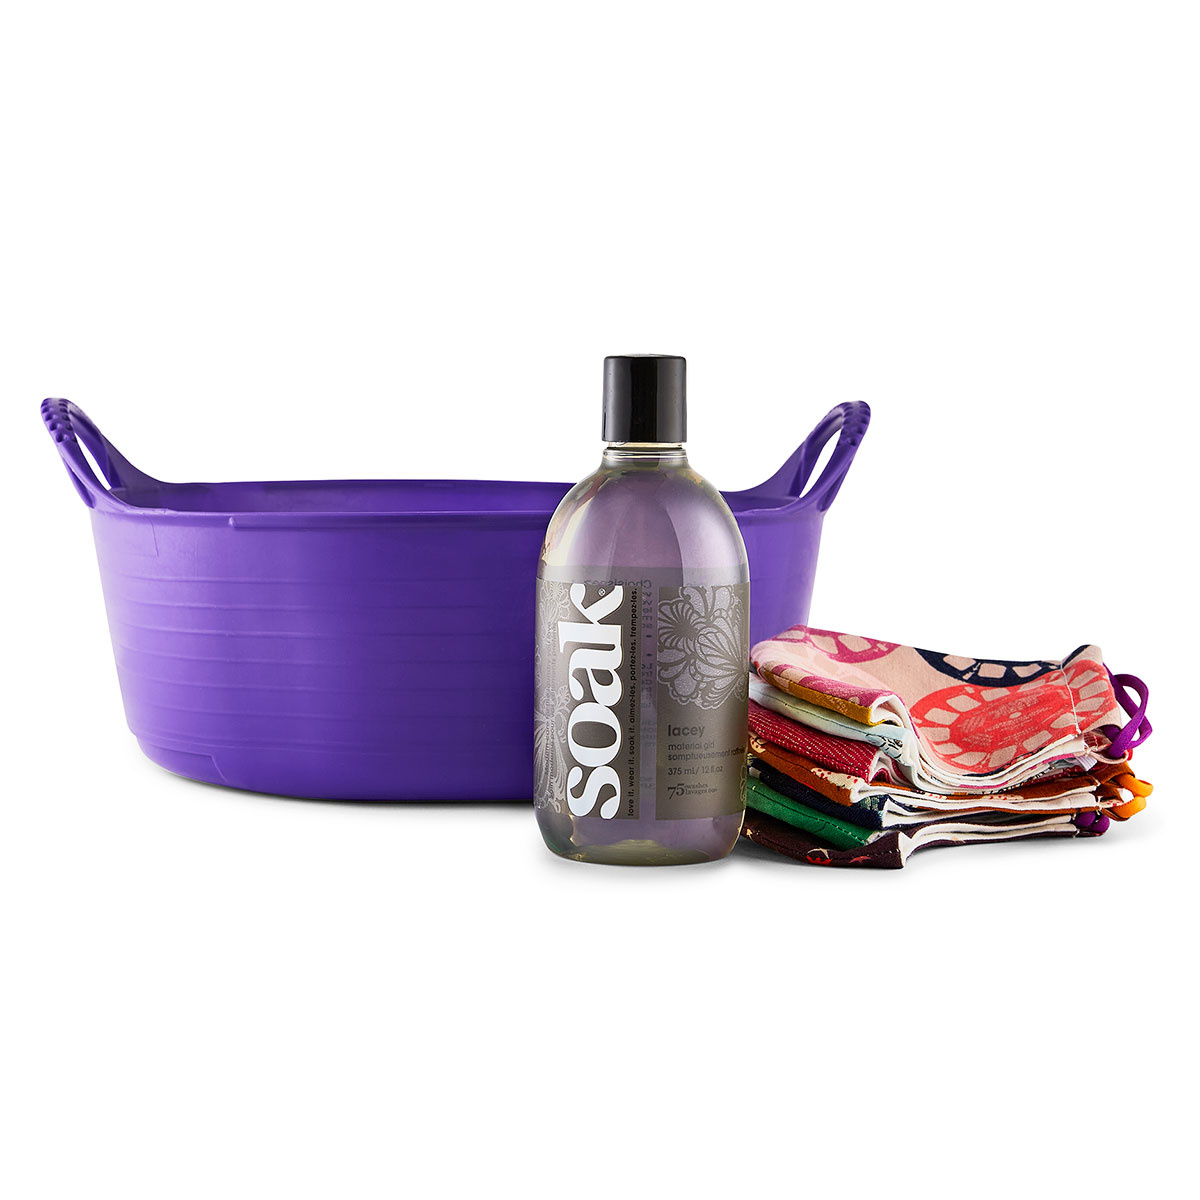 Soak : Minnie Basin Handwashing Kit : Purple + Lacey